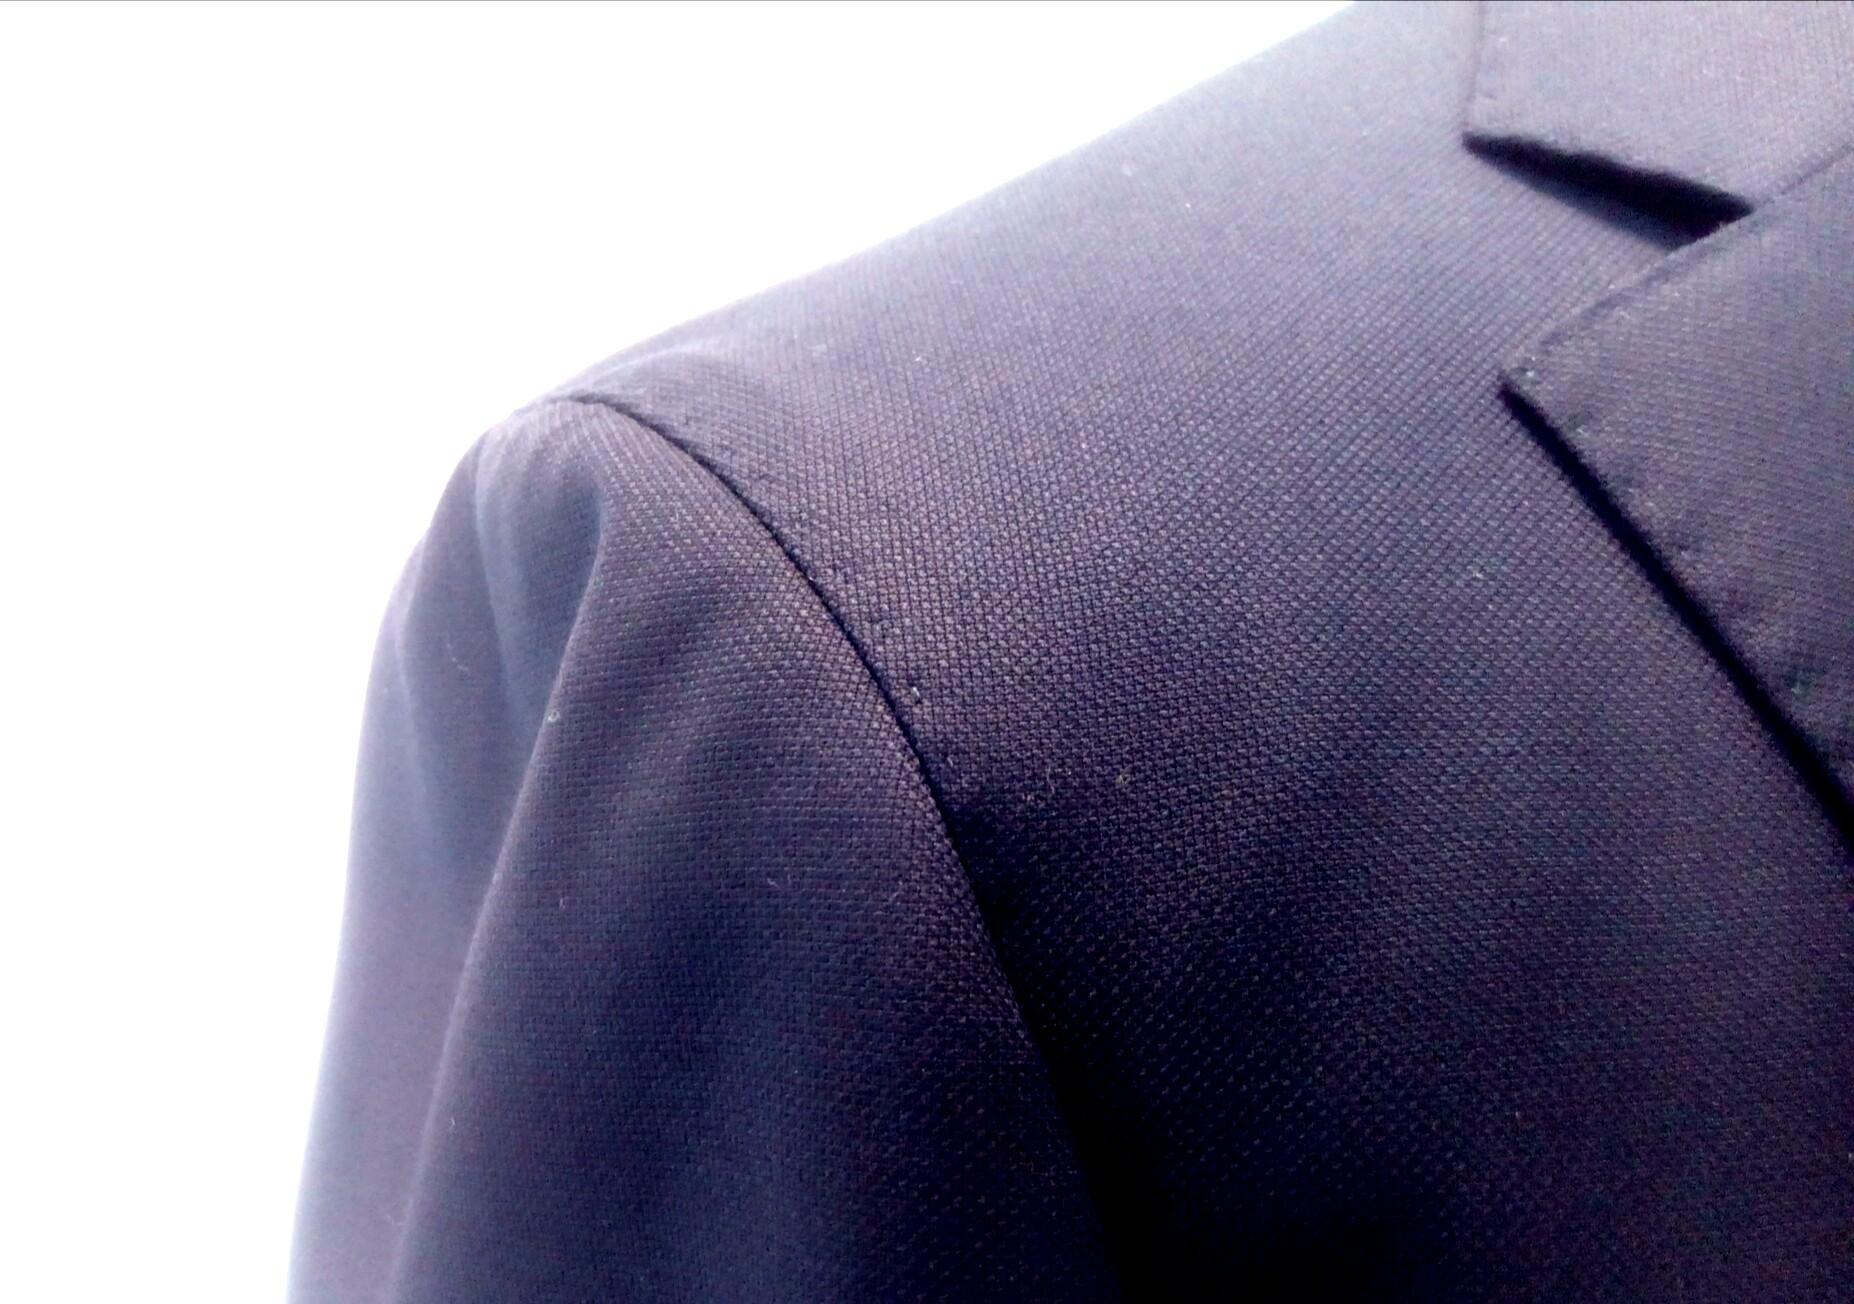 Spalla Camicia or Shirt Sleeve Shoulder